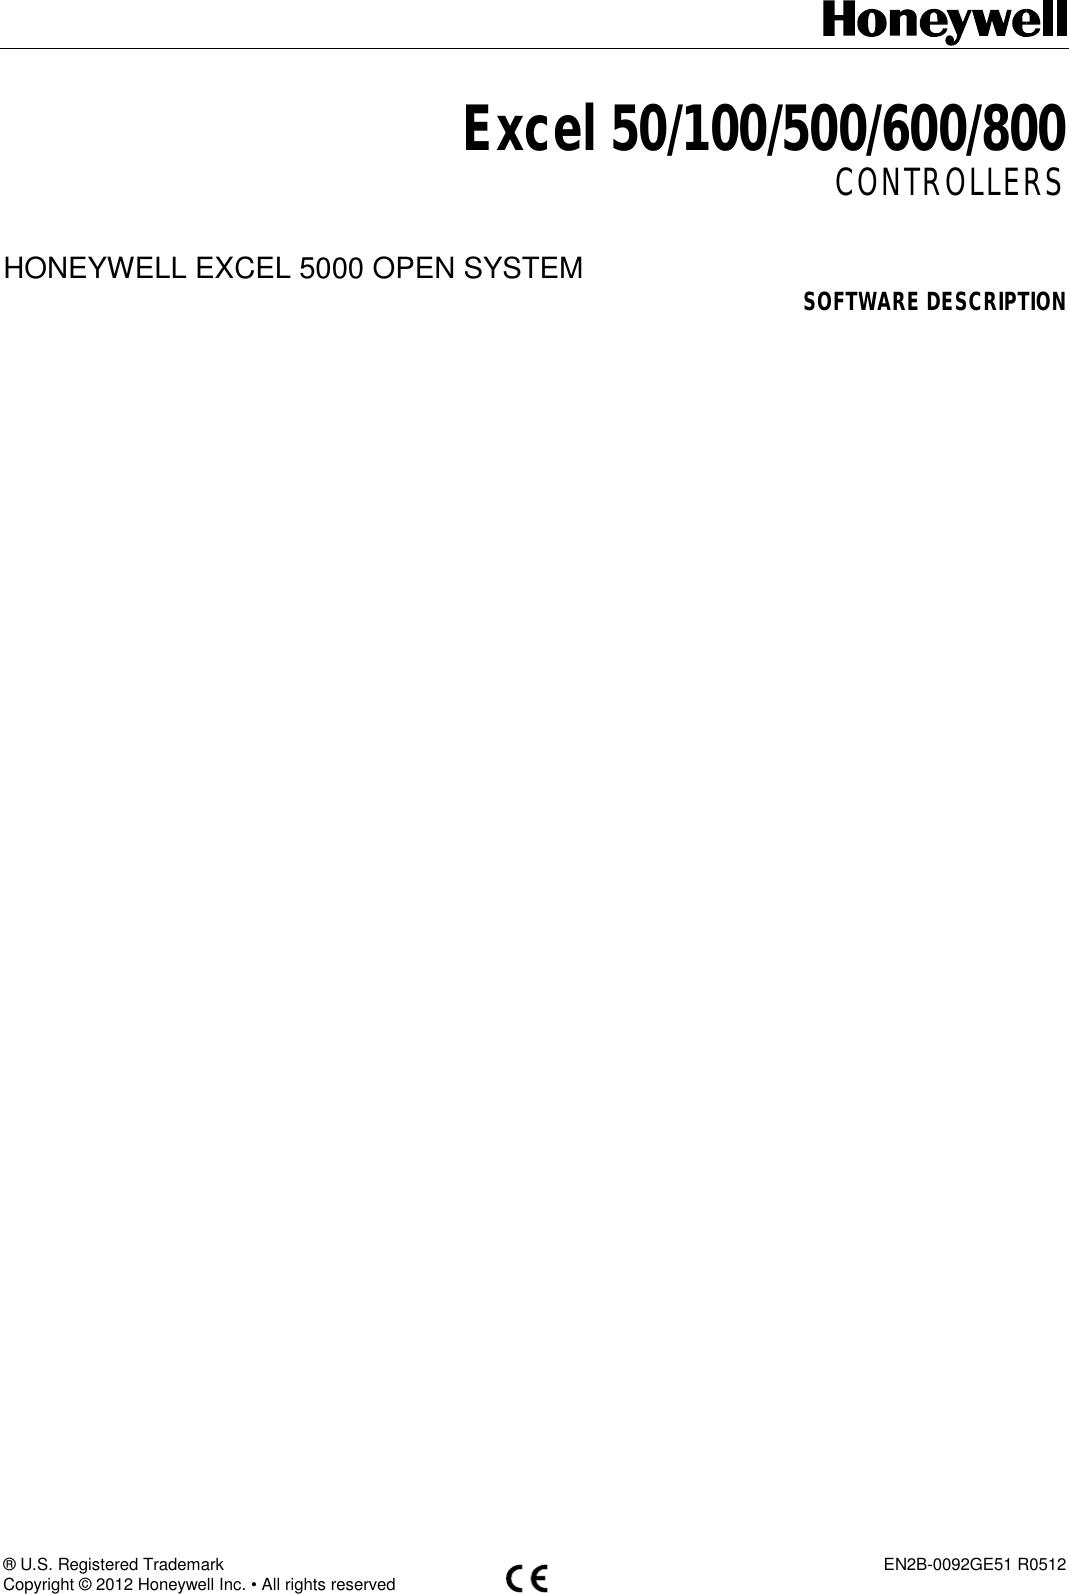 Honeywell Video Game Controller R0512 Users Manual XL50 XL100 XL500